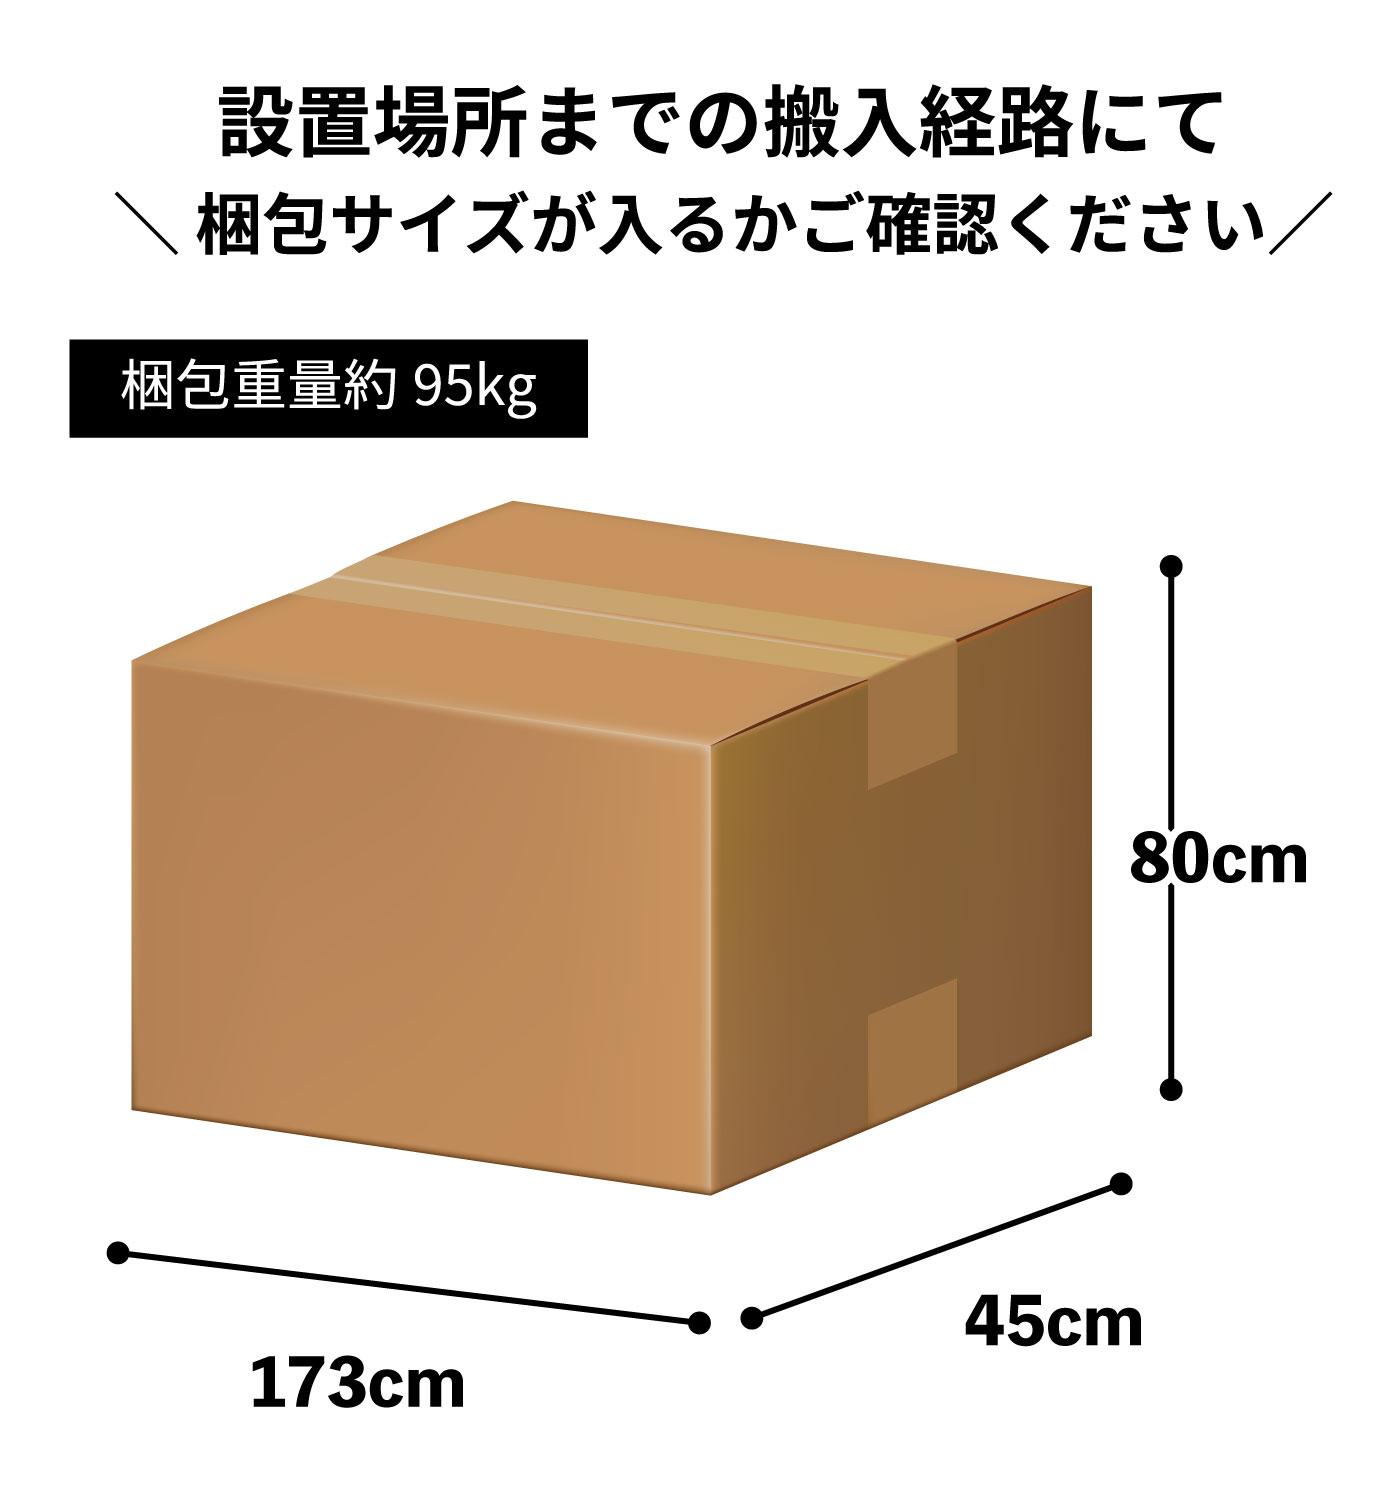 DK-R13の梱包サイズ